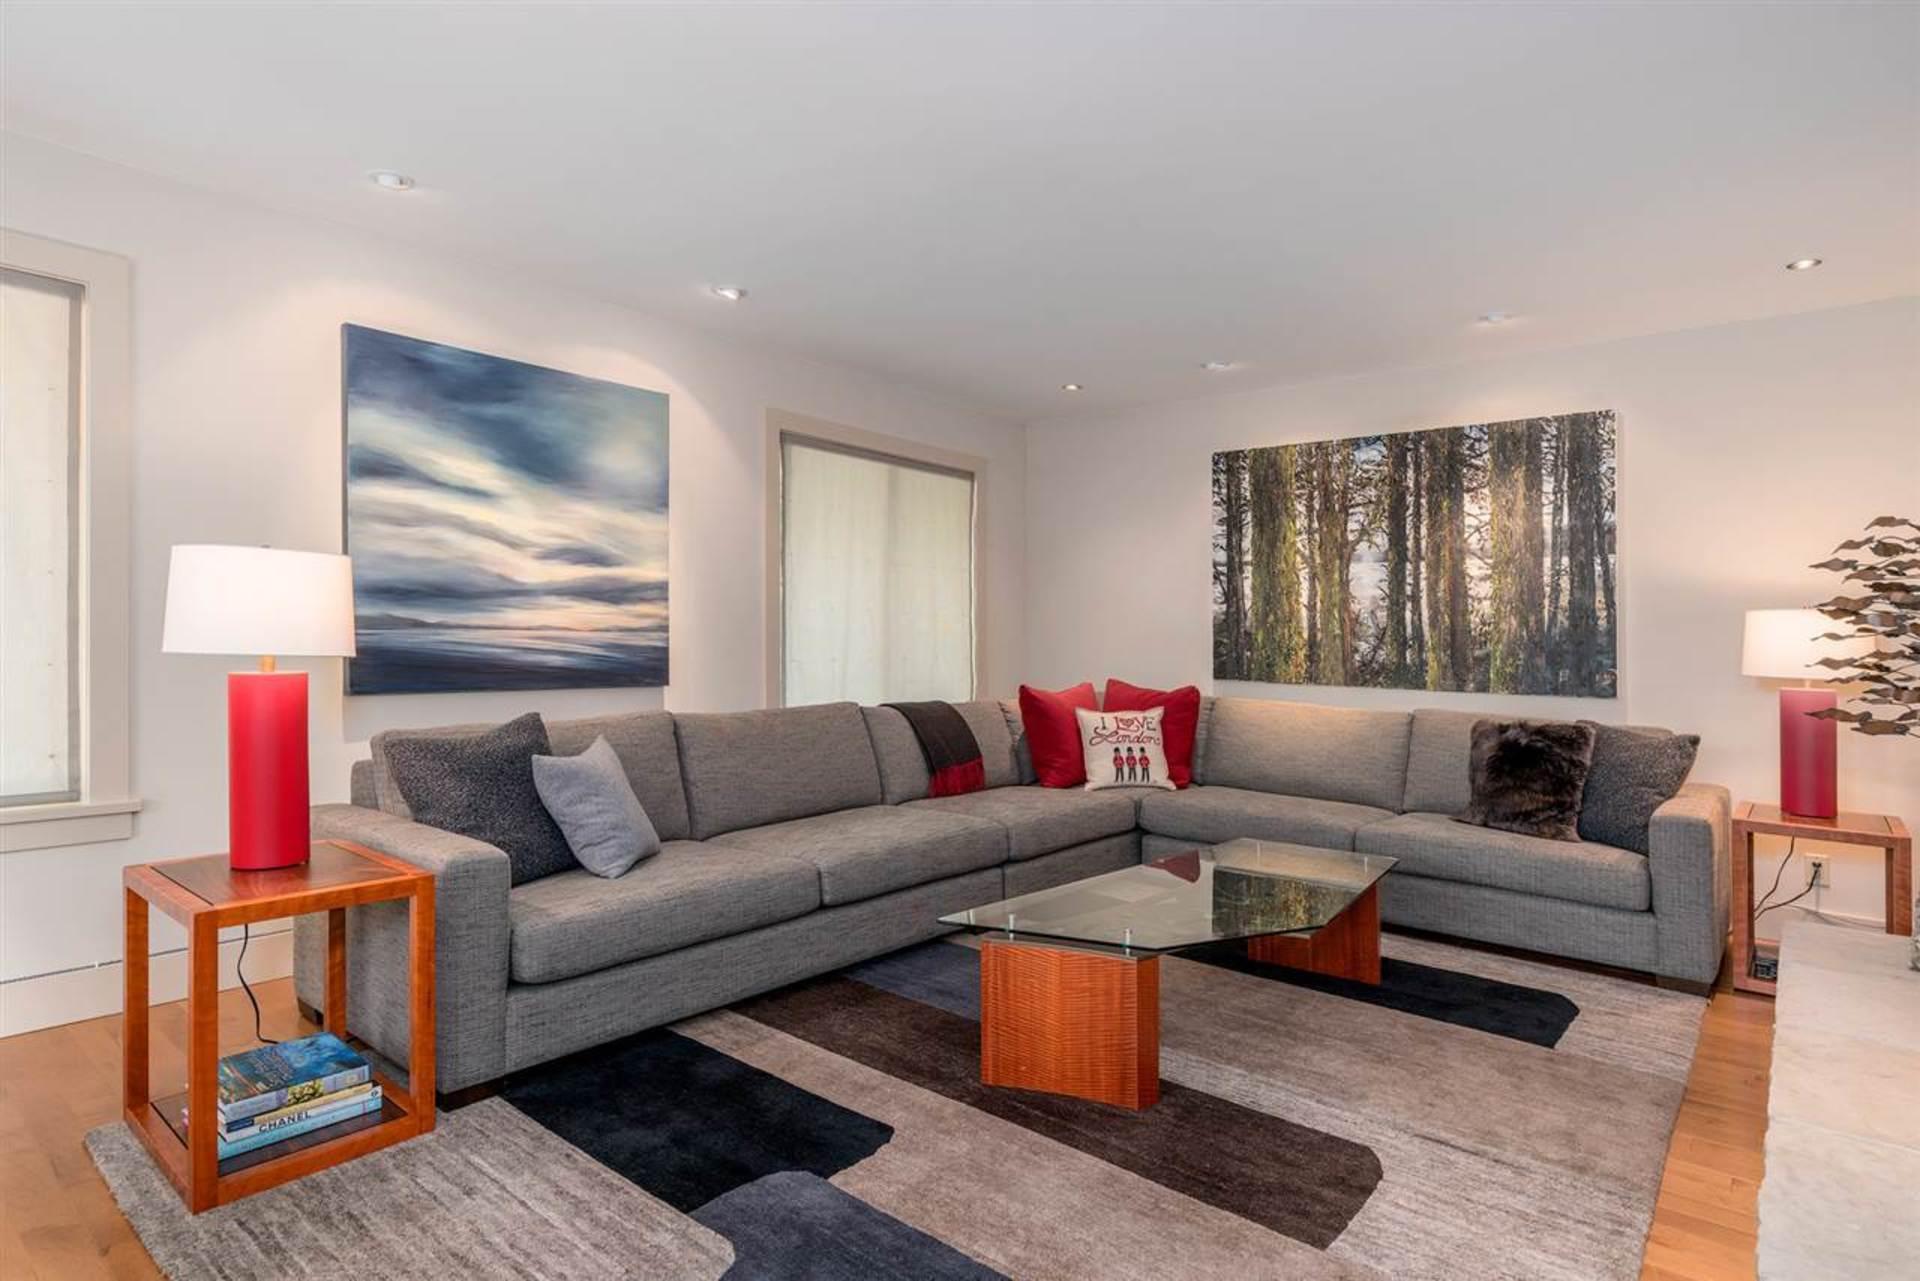 4620-woodburn-road-cypress-park-estates-west-vancouver-02 at 4620 Woodburn Road, Cypress Park Estates, West Vancouver